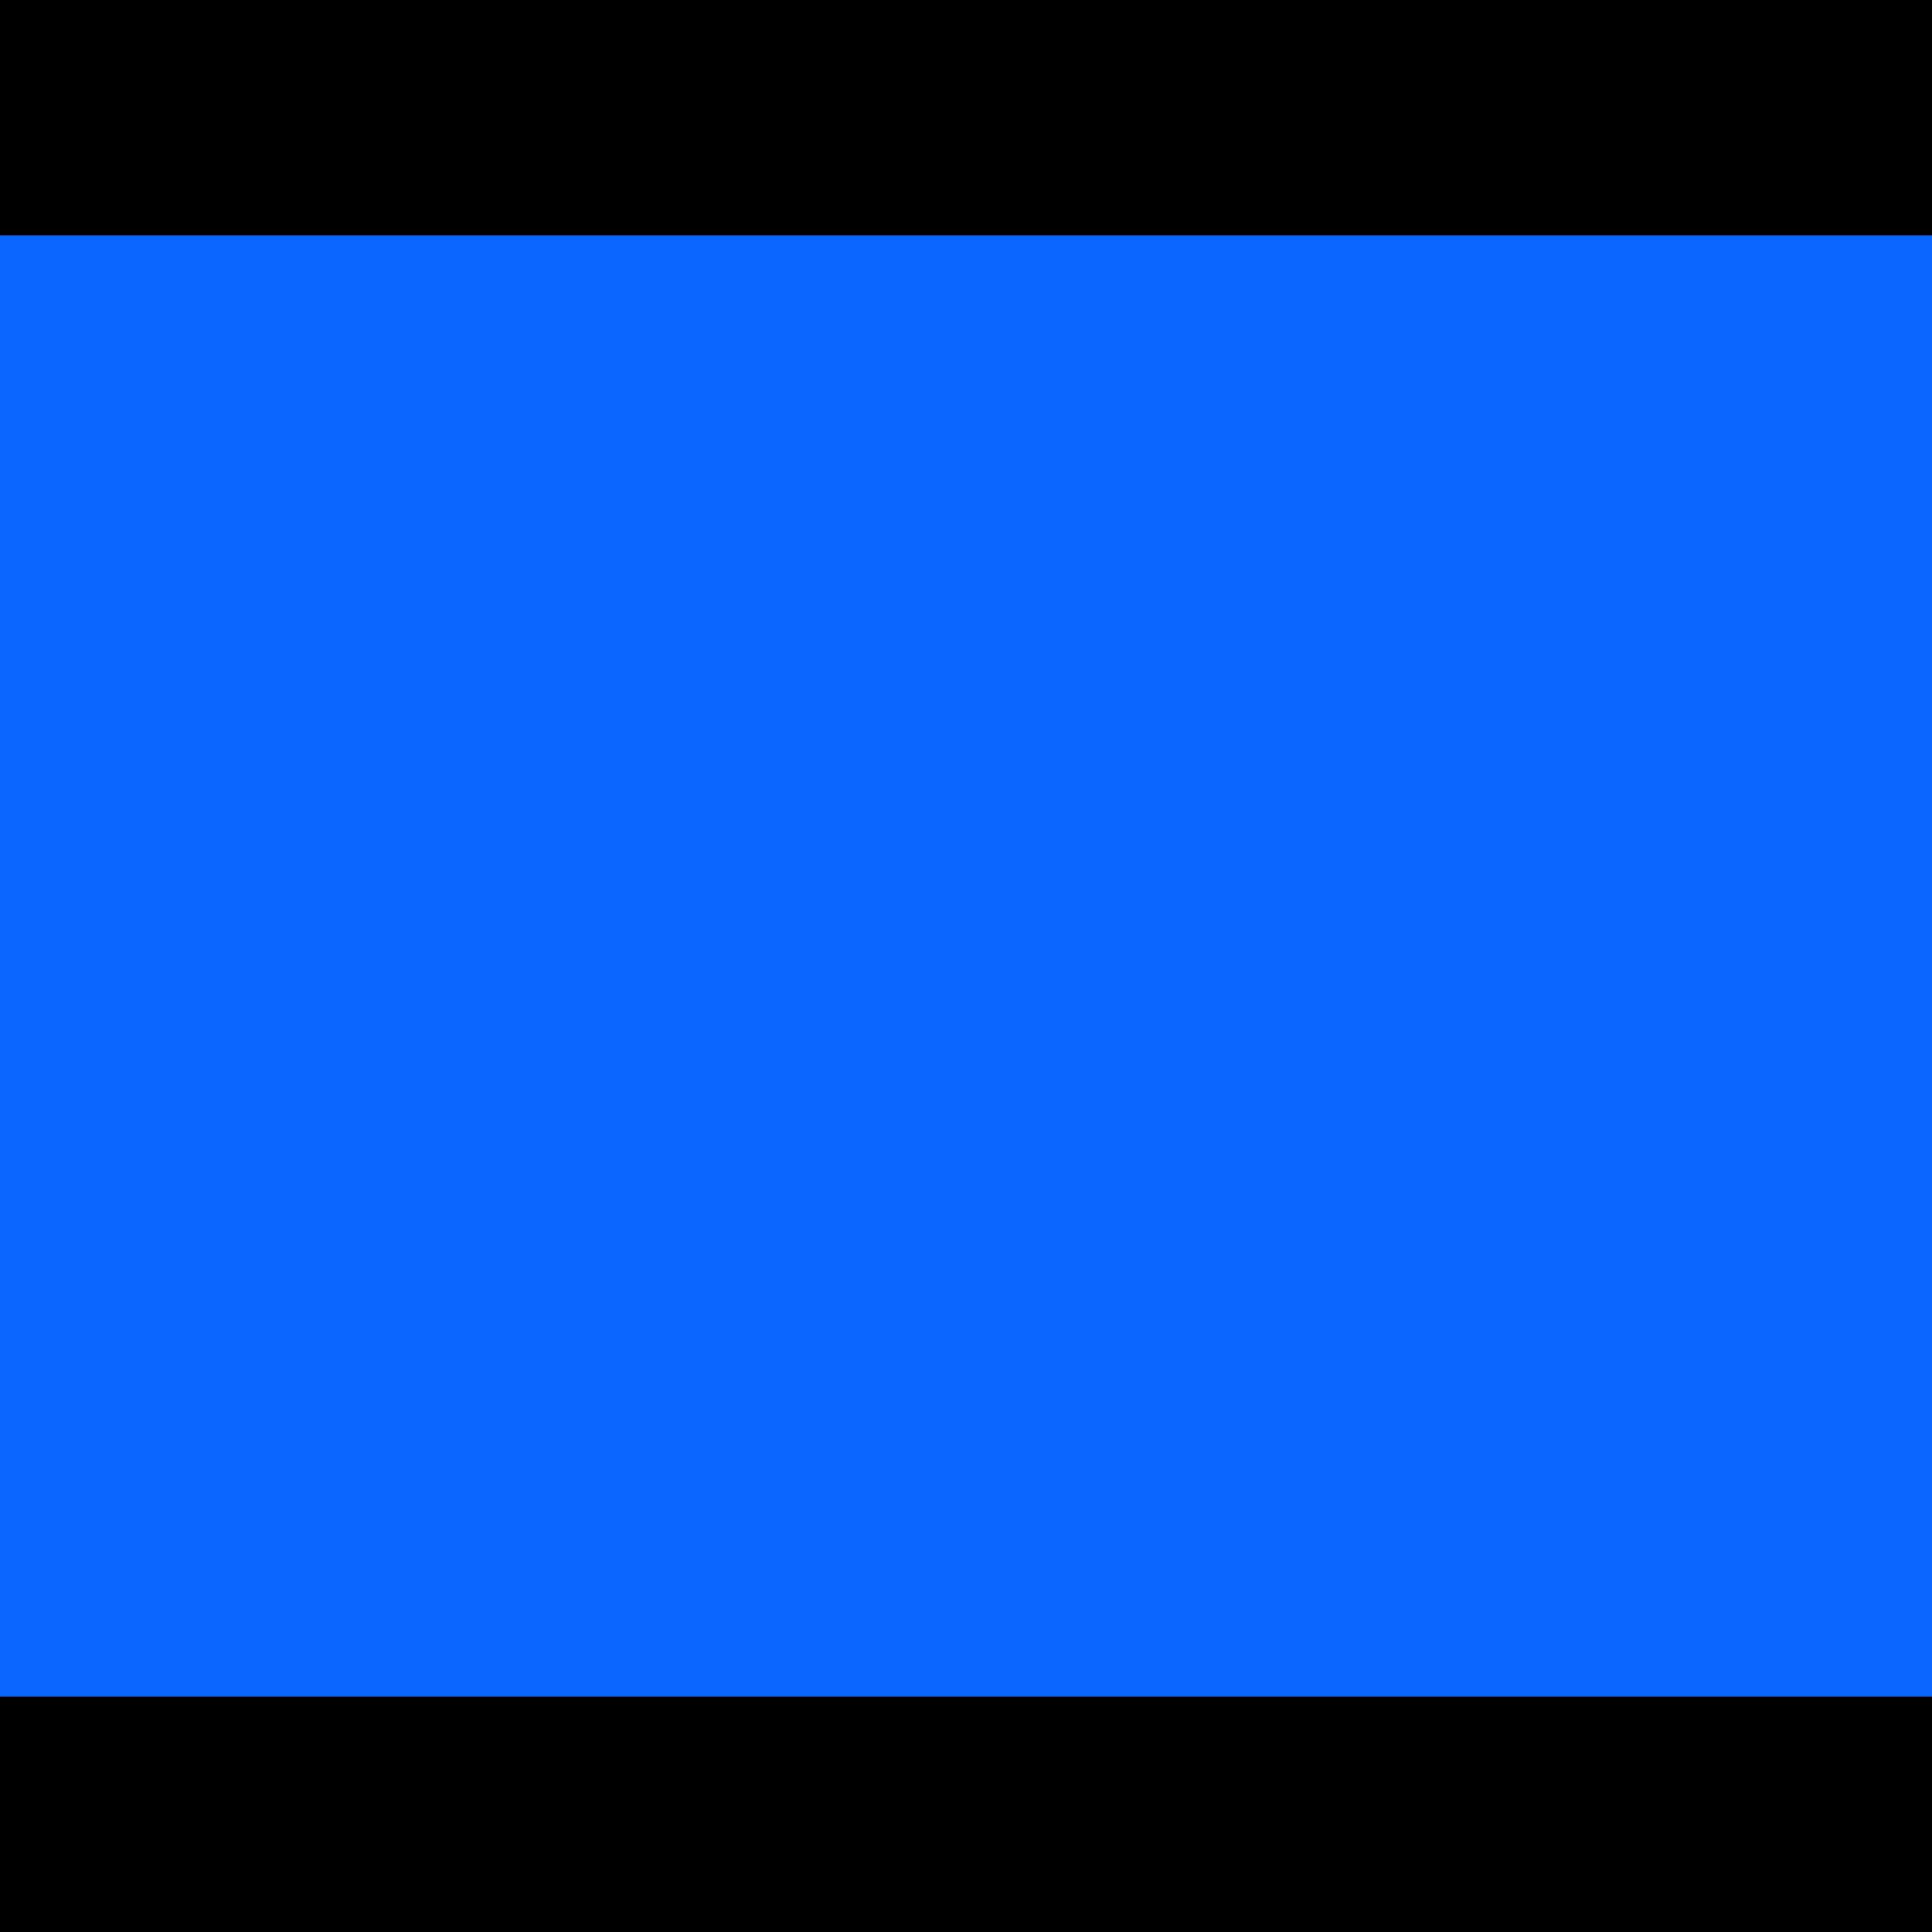 The logo of Jonathan Rodriguez/ Rodzjon/ Jon Rodz